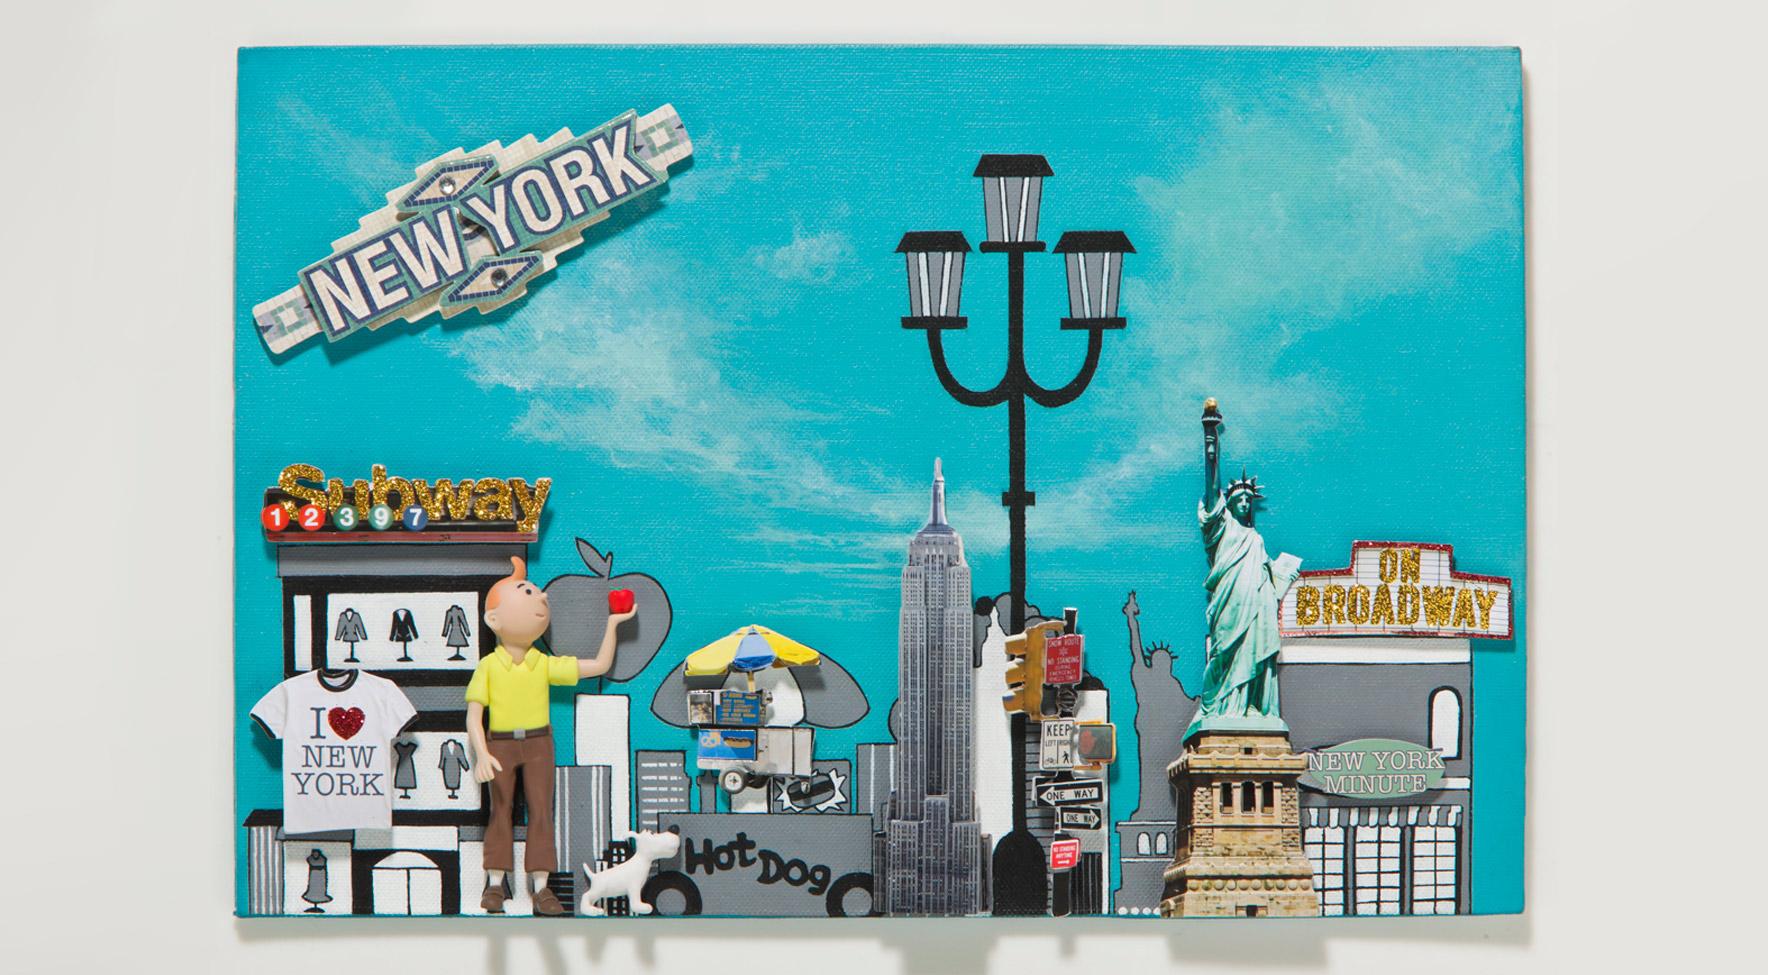 gabriel_ortega_new_york_tintin